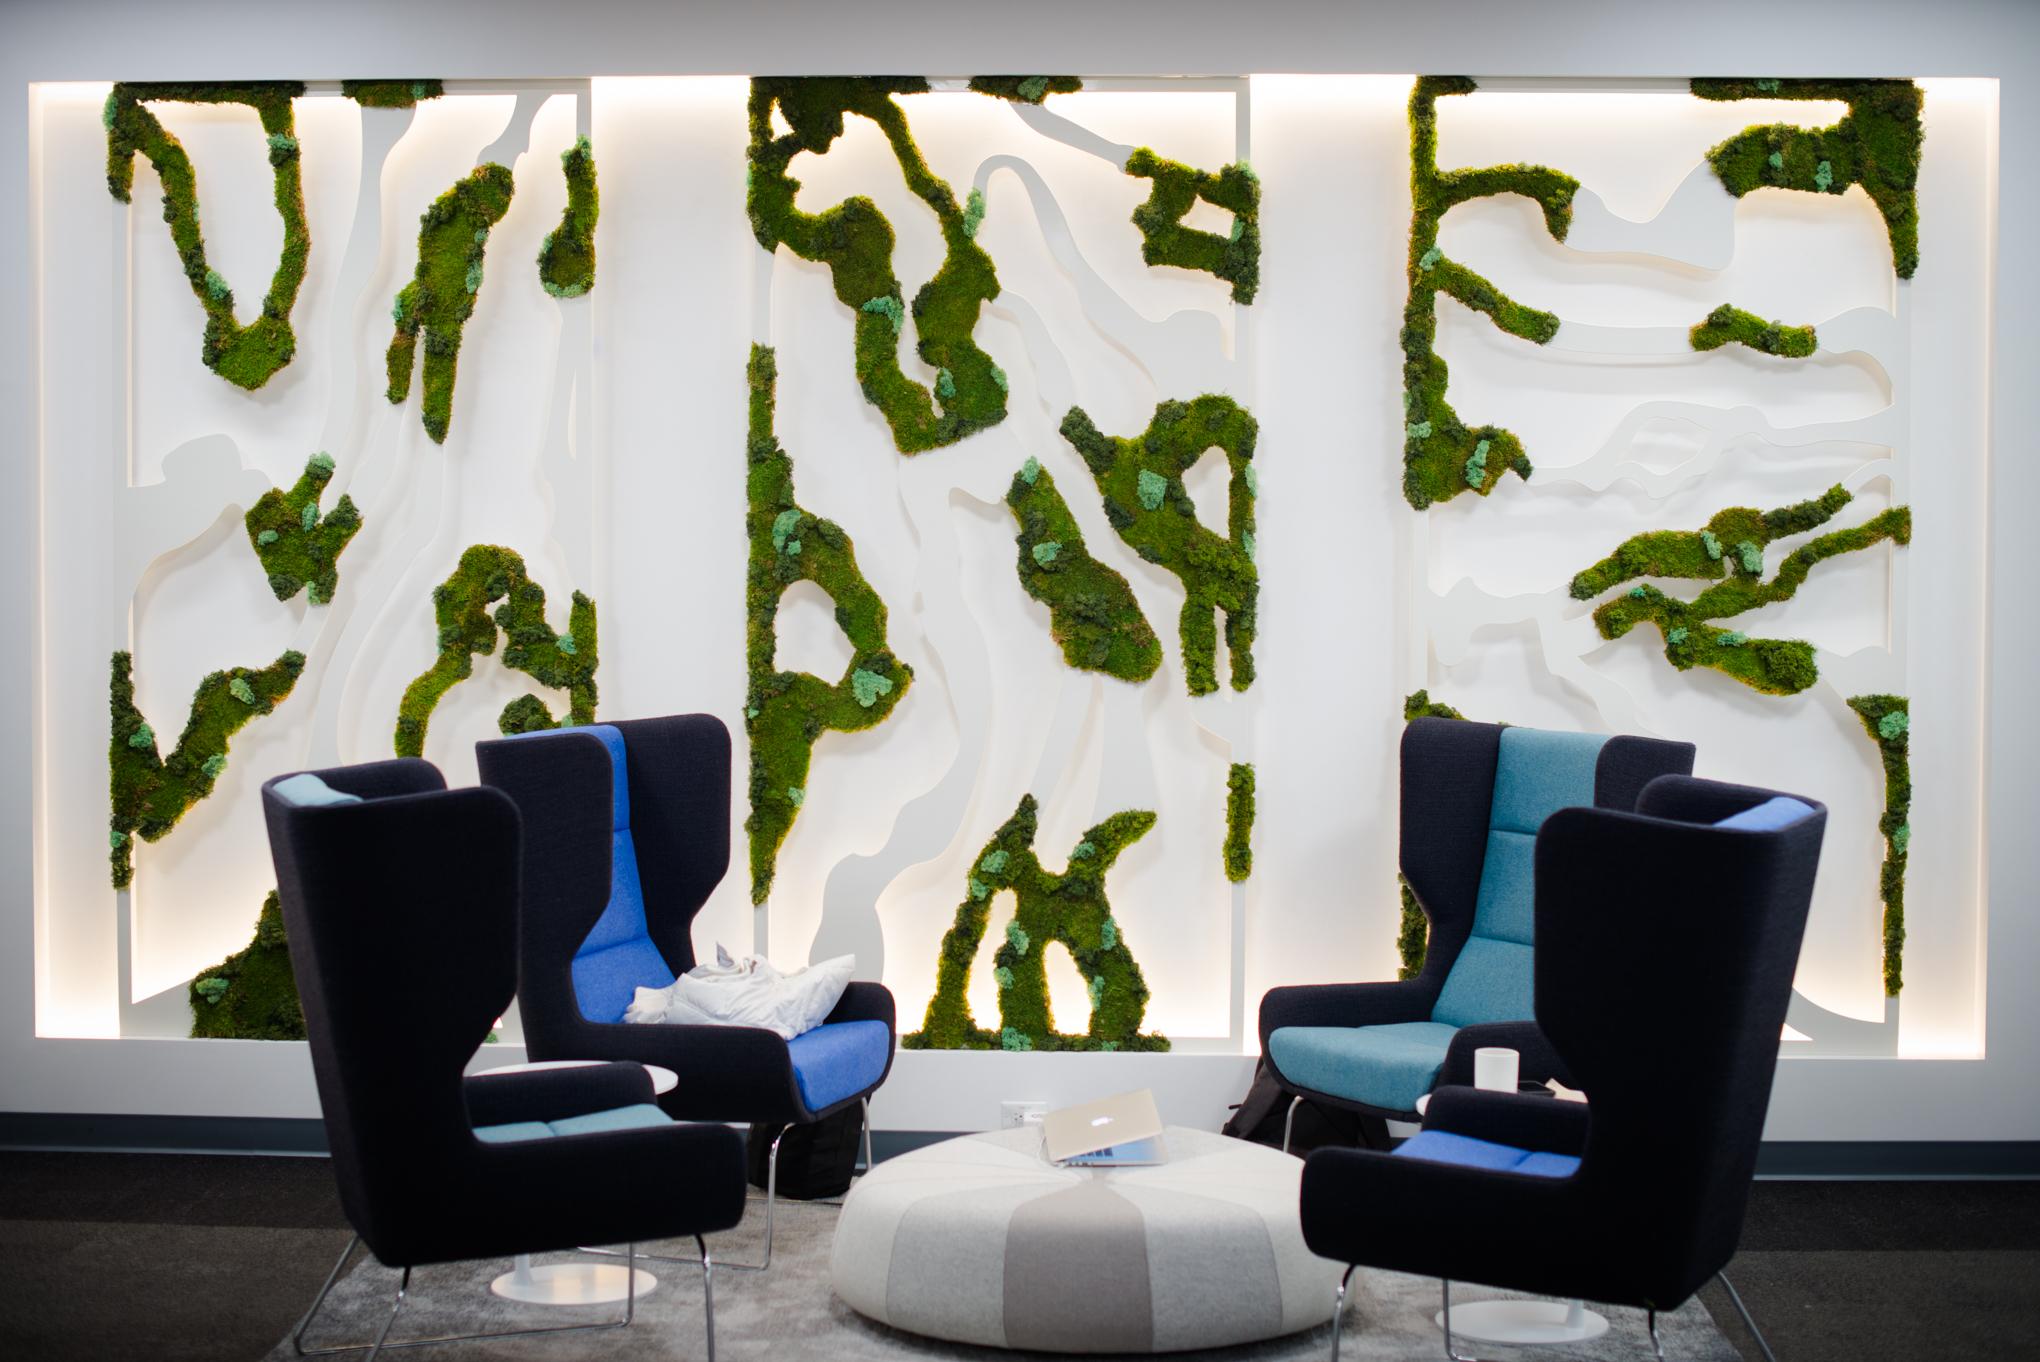 AddLife-Moss-Walls-005.jpg